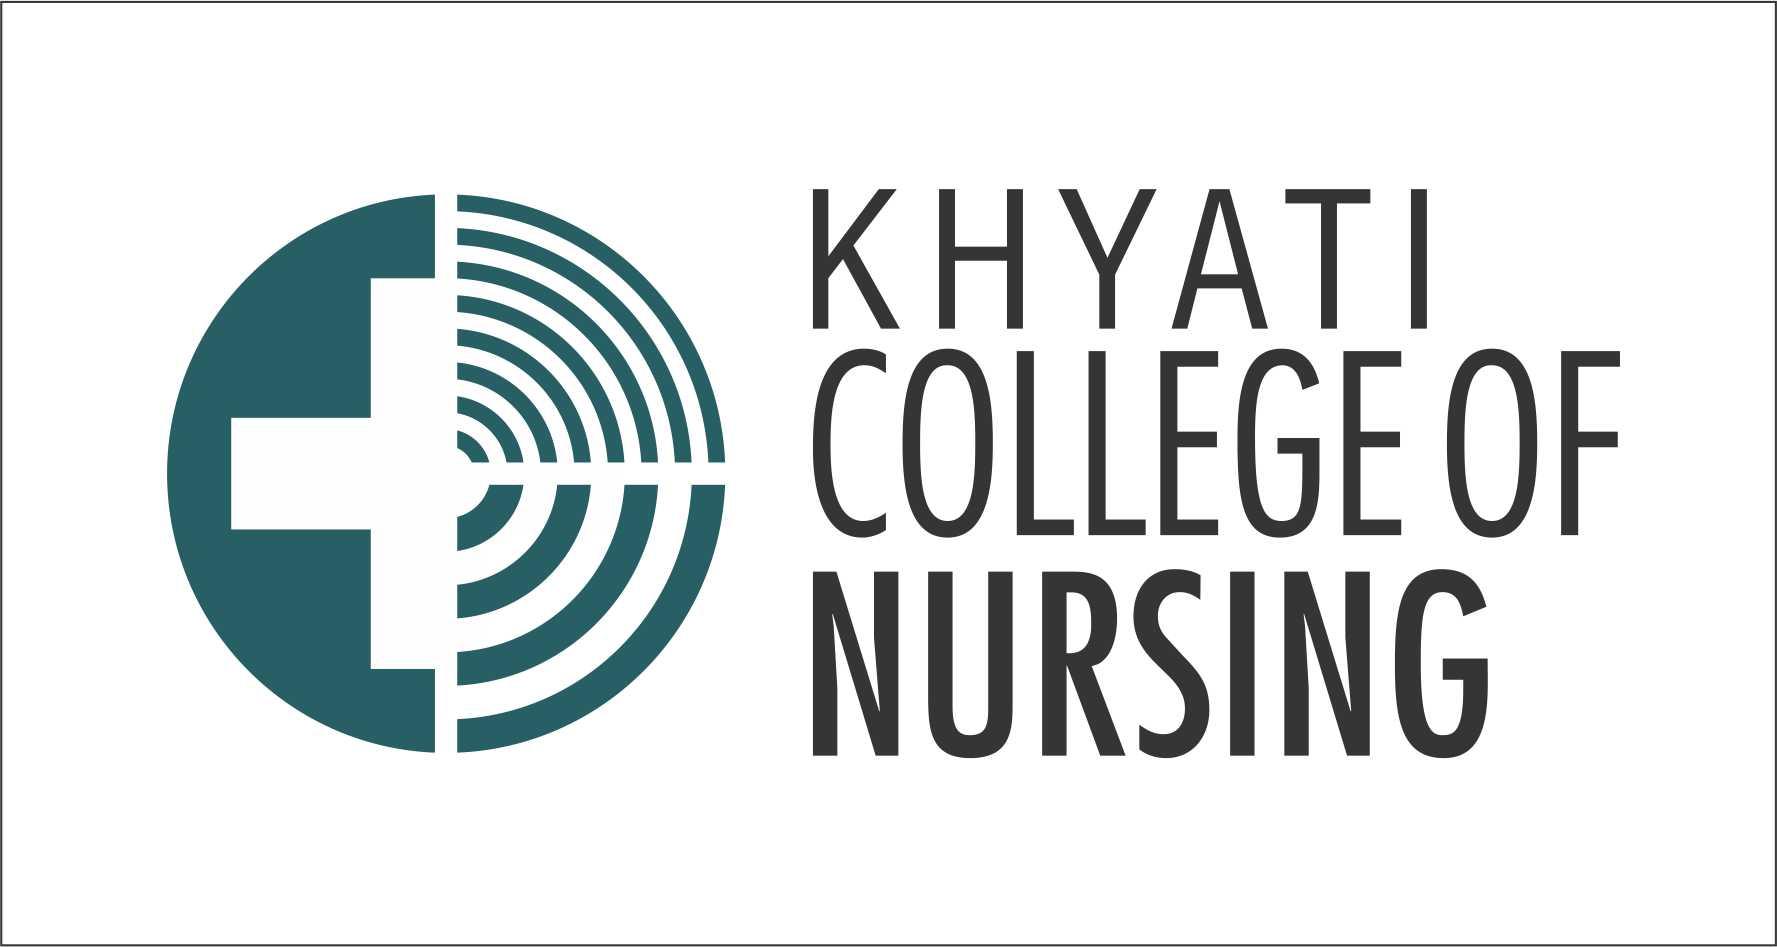 Khyati college of nursing